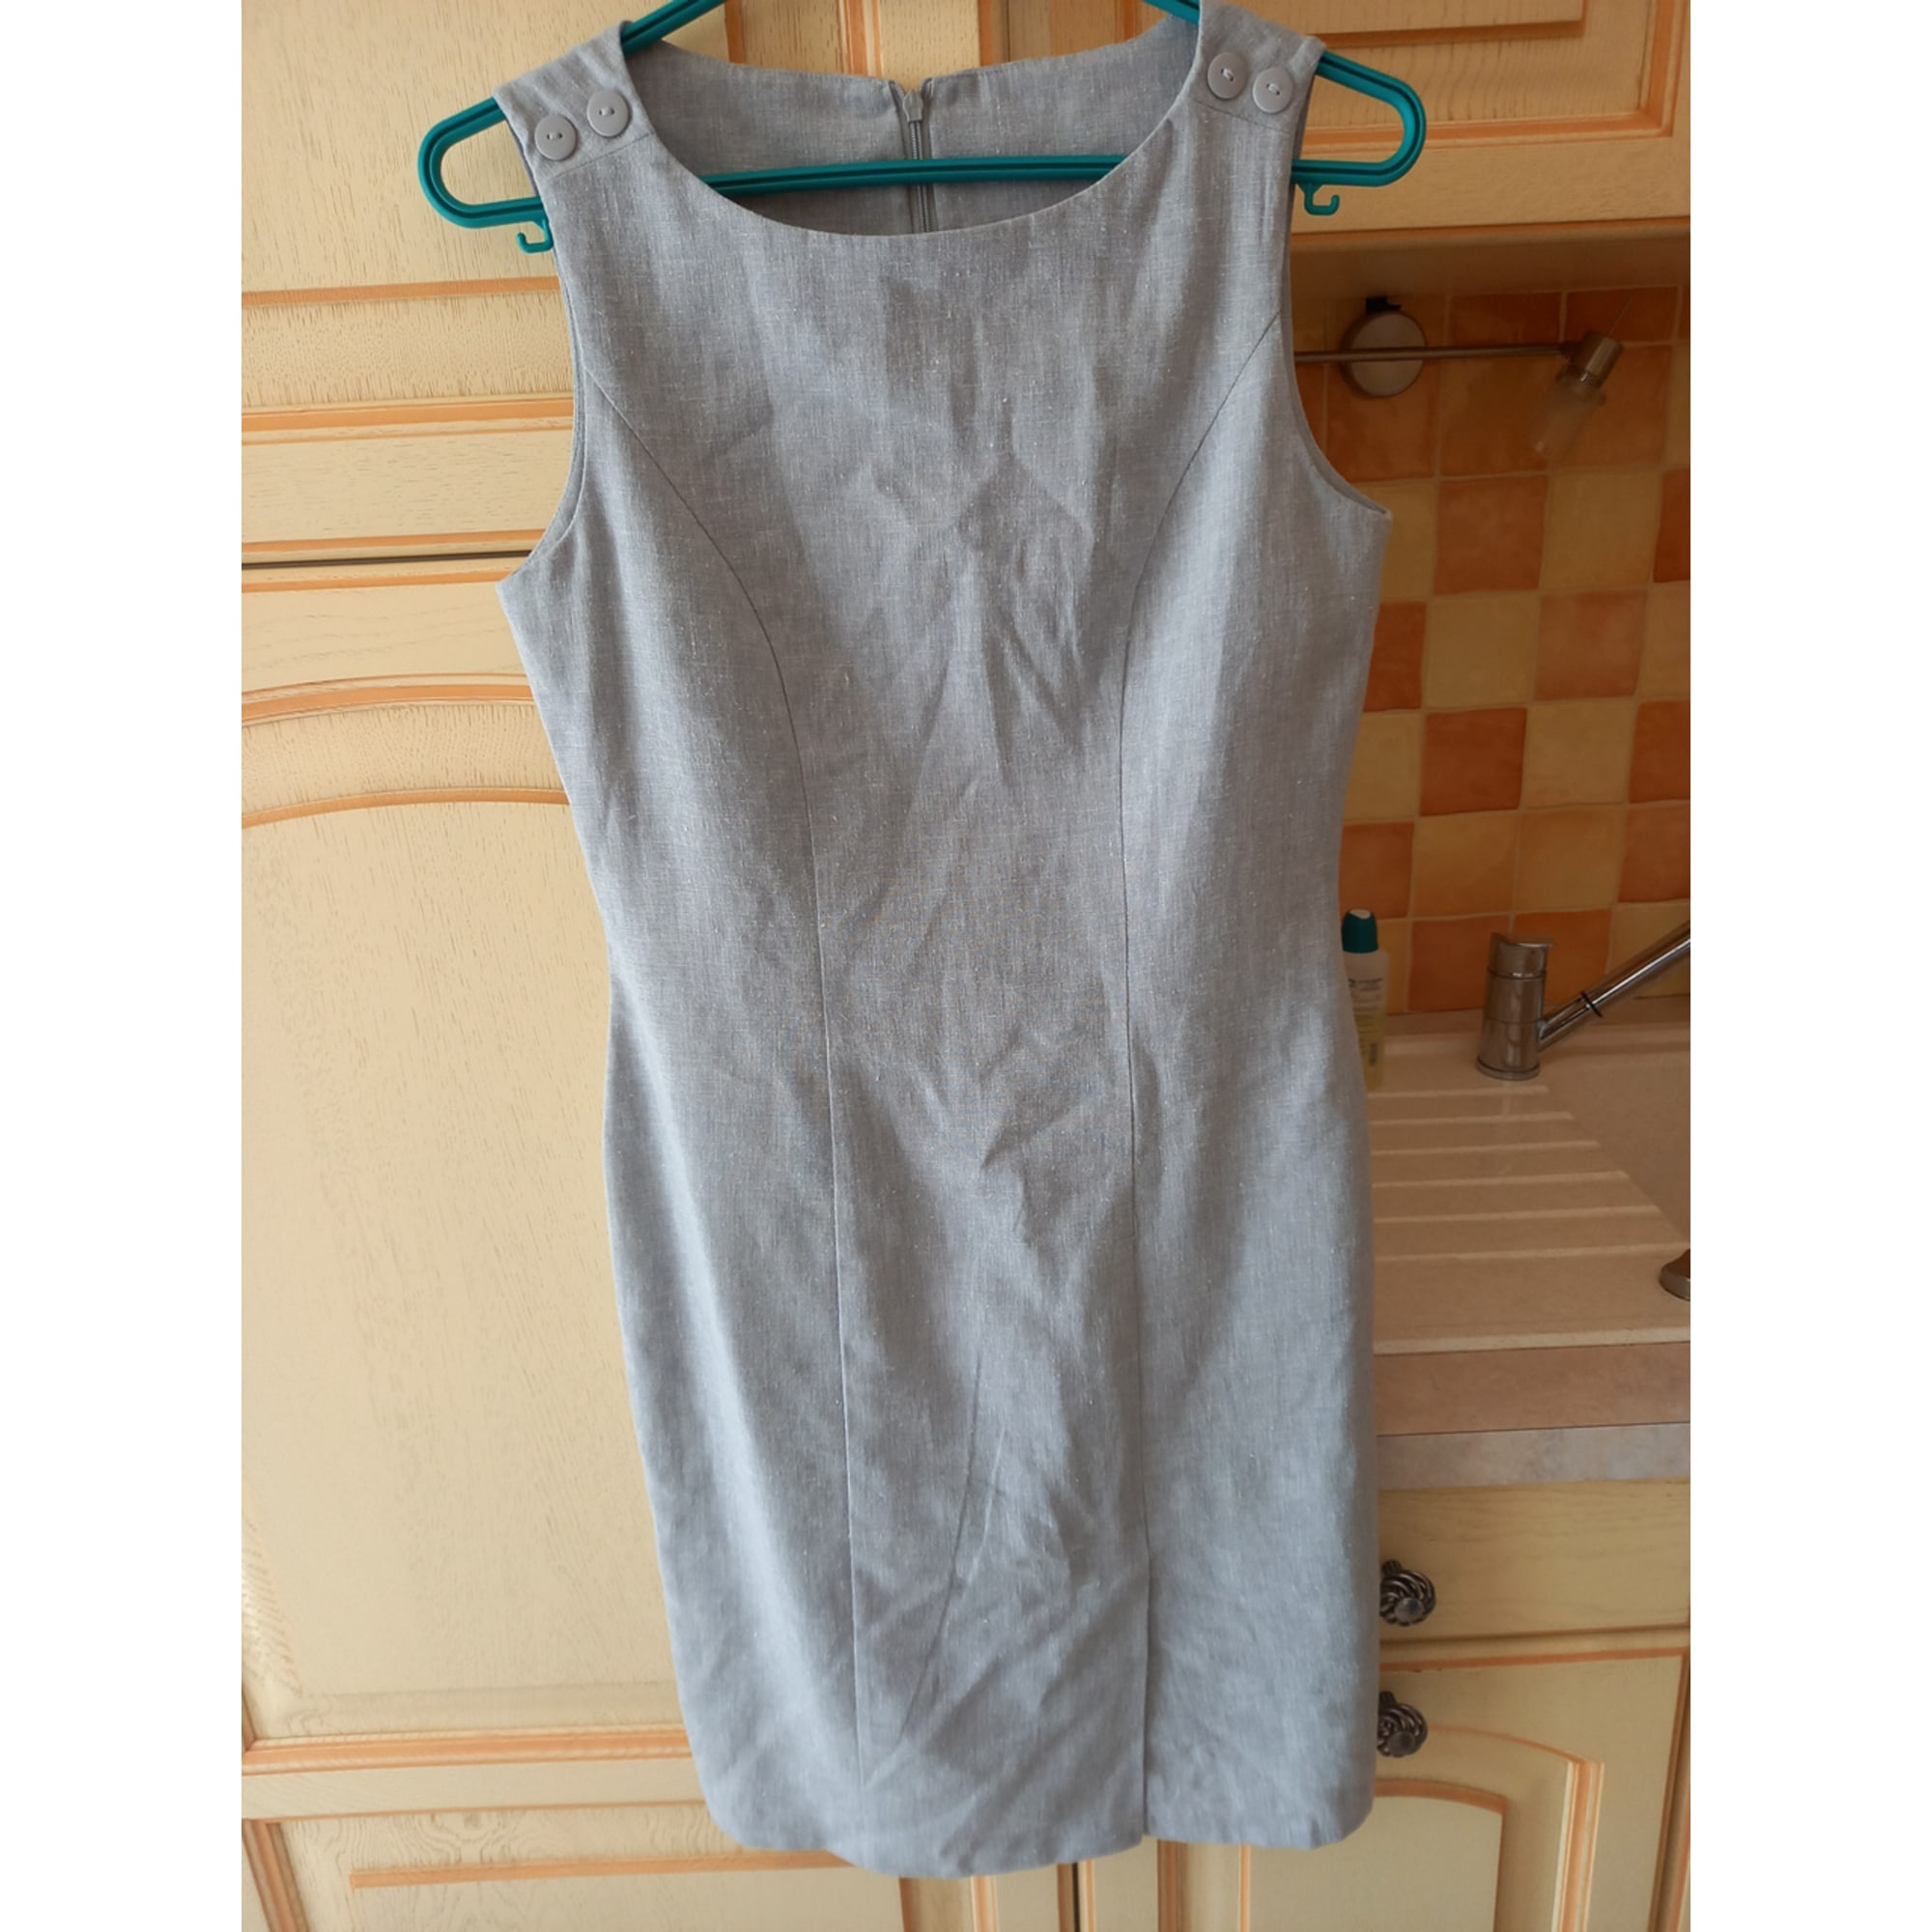 Robe mi-longue MARQUE INCONNUE Gris, anthracite